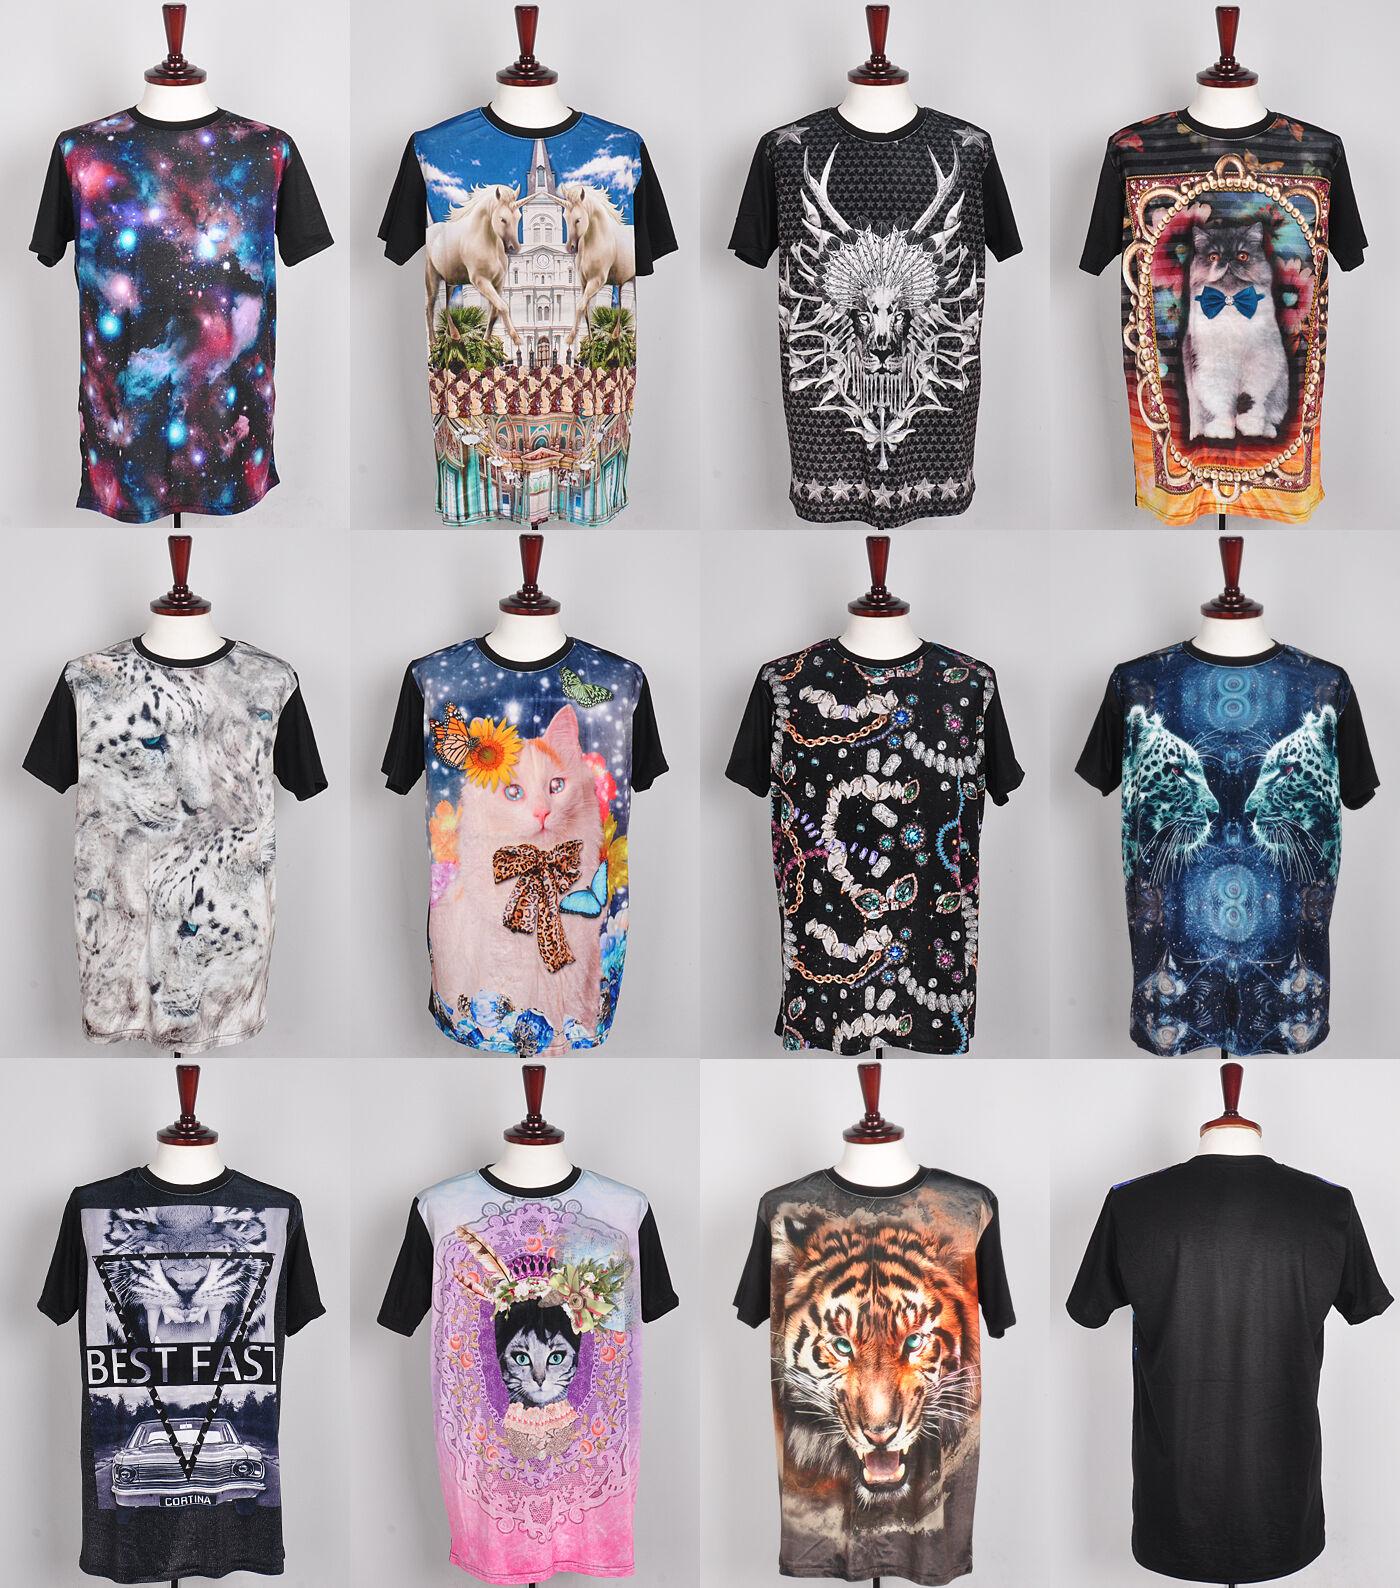 New Unisex womens Velvet galaxy space t shirt cat print short sleeve top blouse